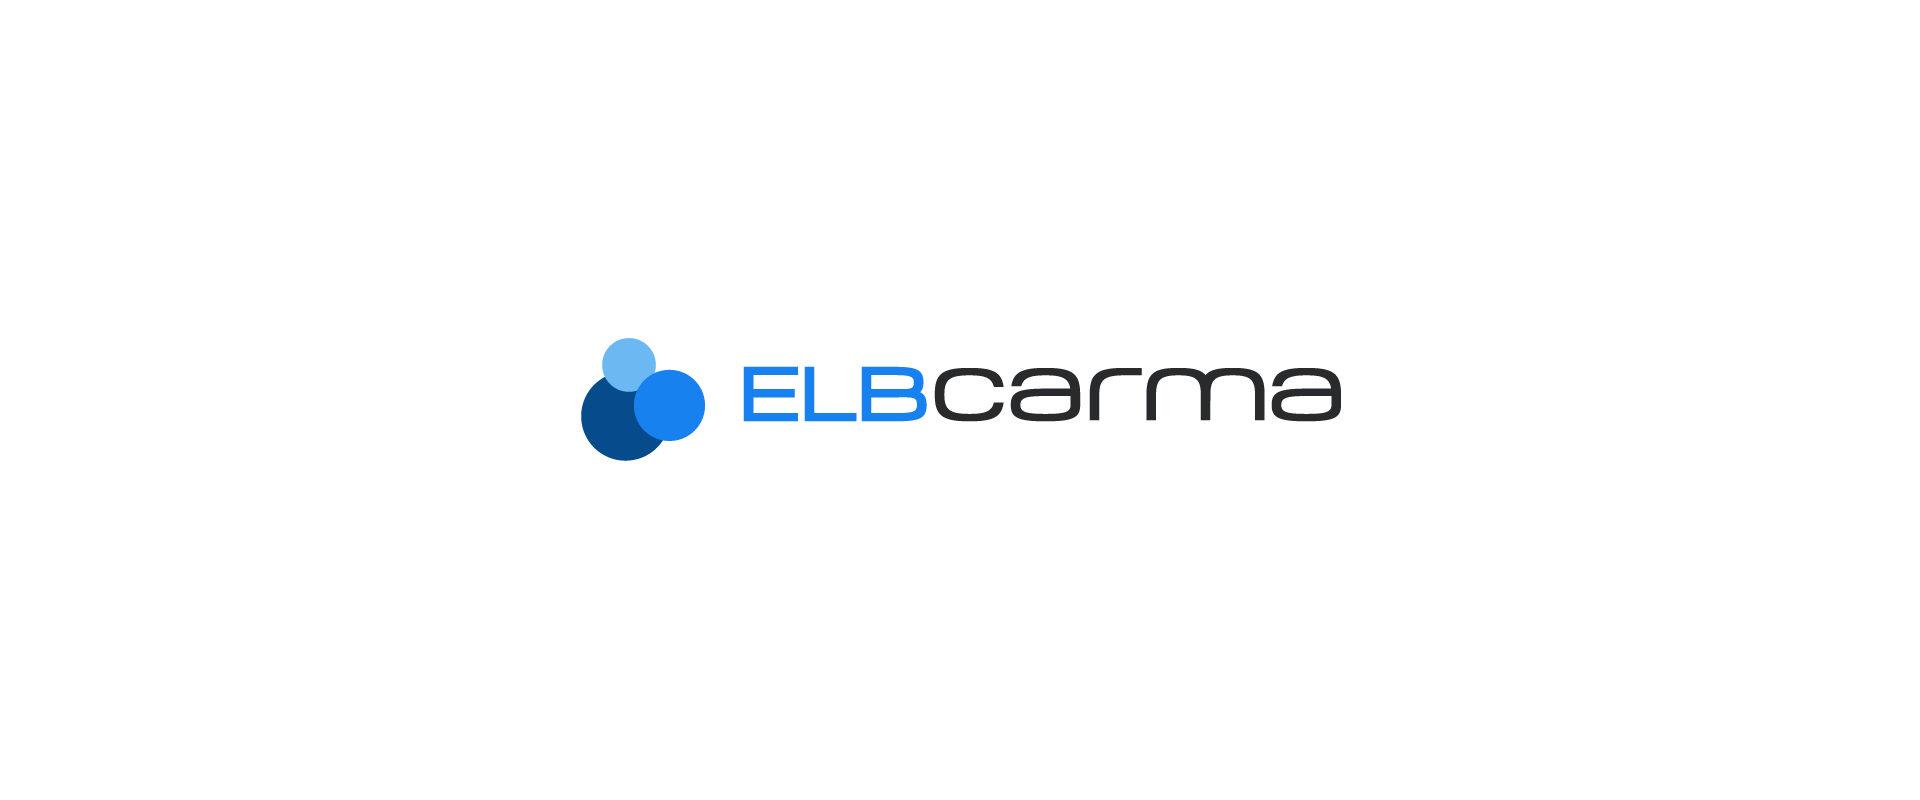 Elbcarma Logo